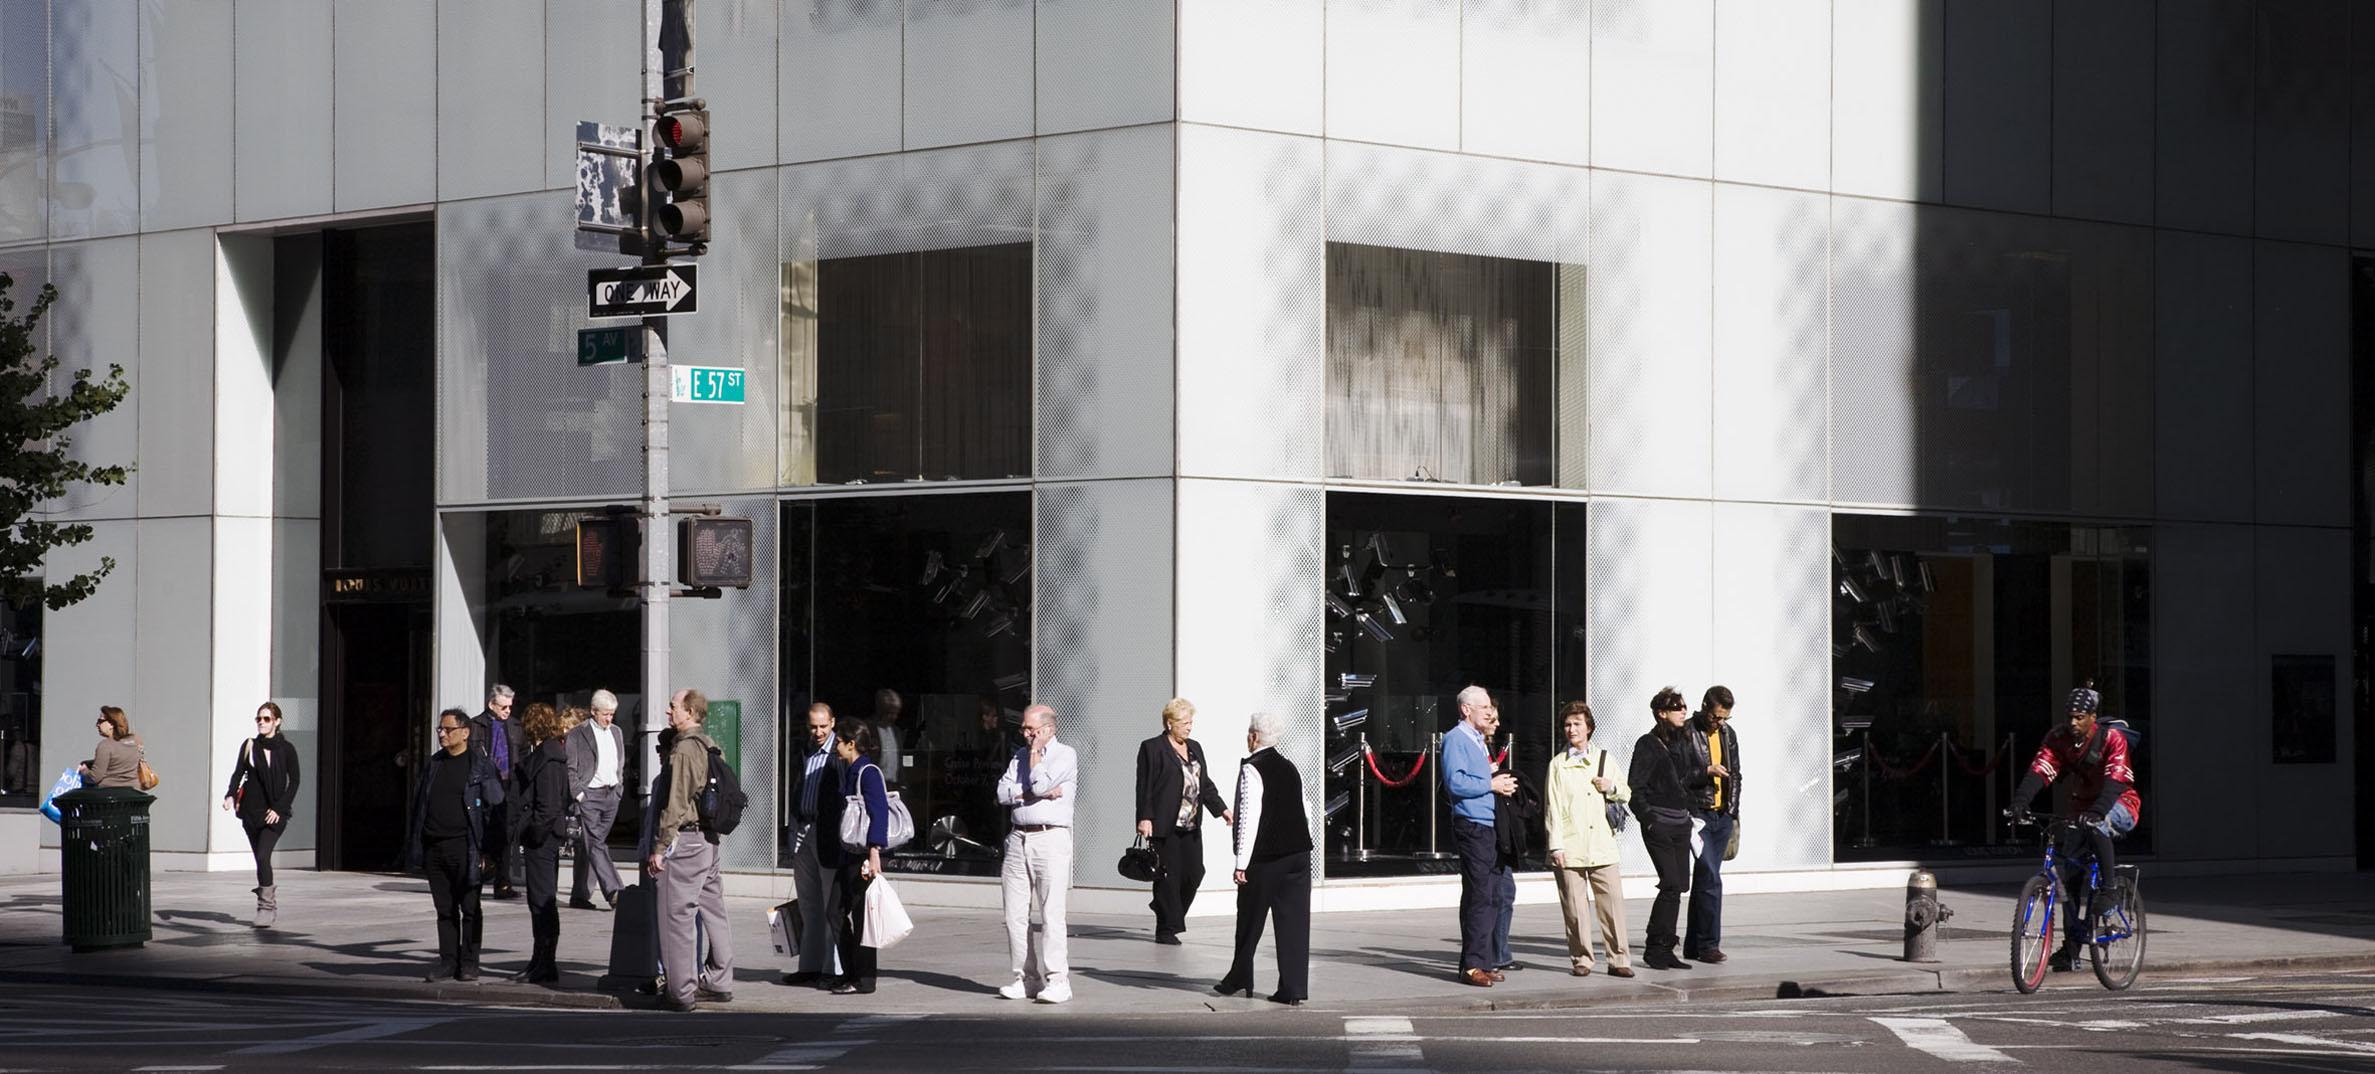 Gudrun Kemsa: Fifth Avenue 2, 2009, 86 x 198 cm, C-Print, Diasec